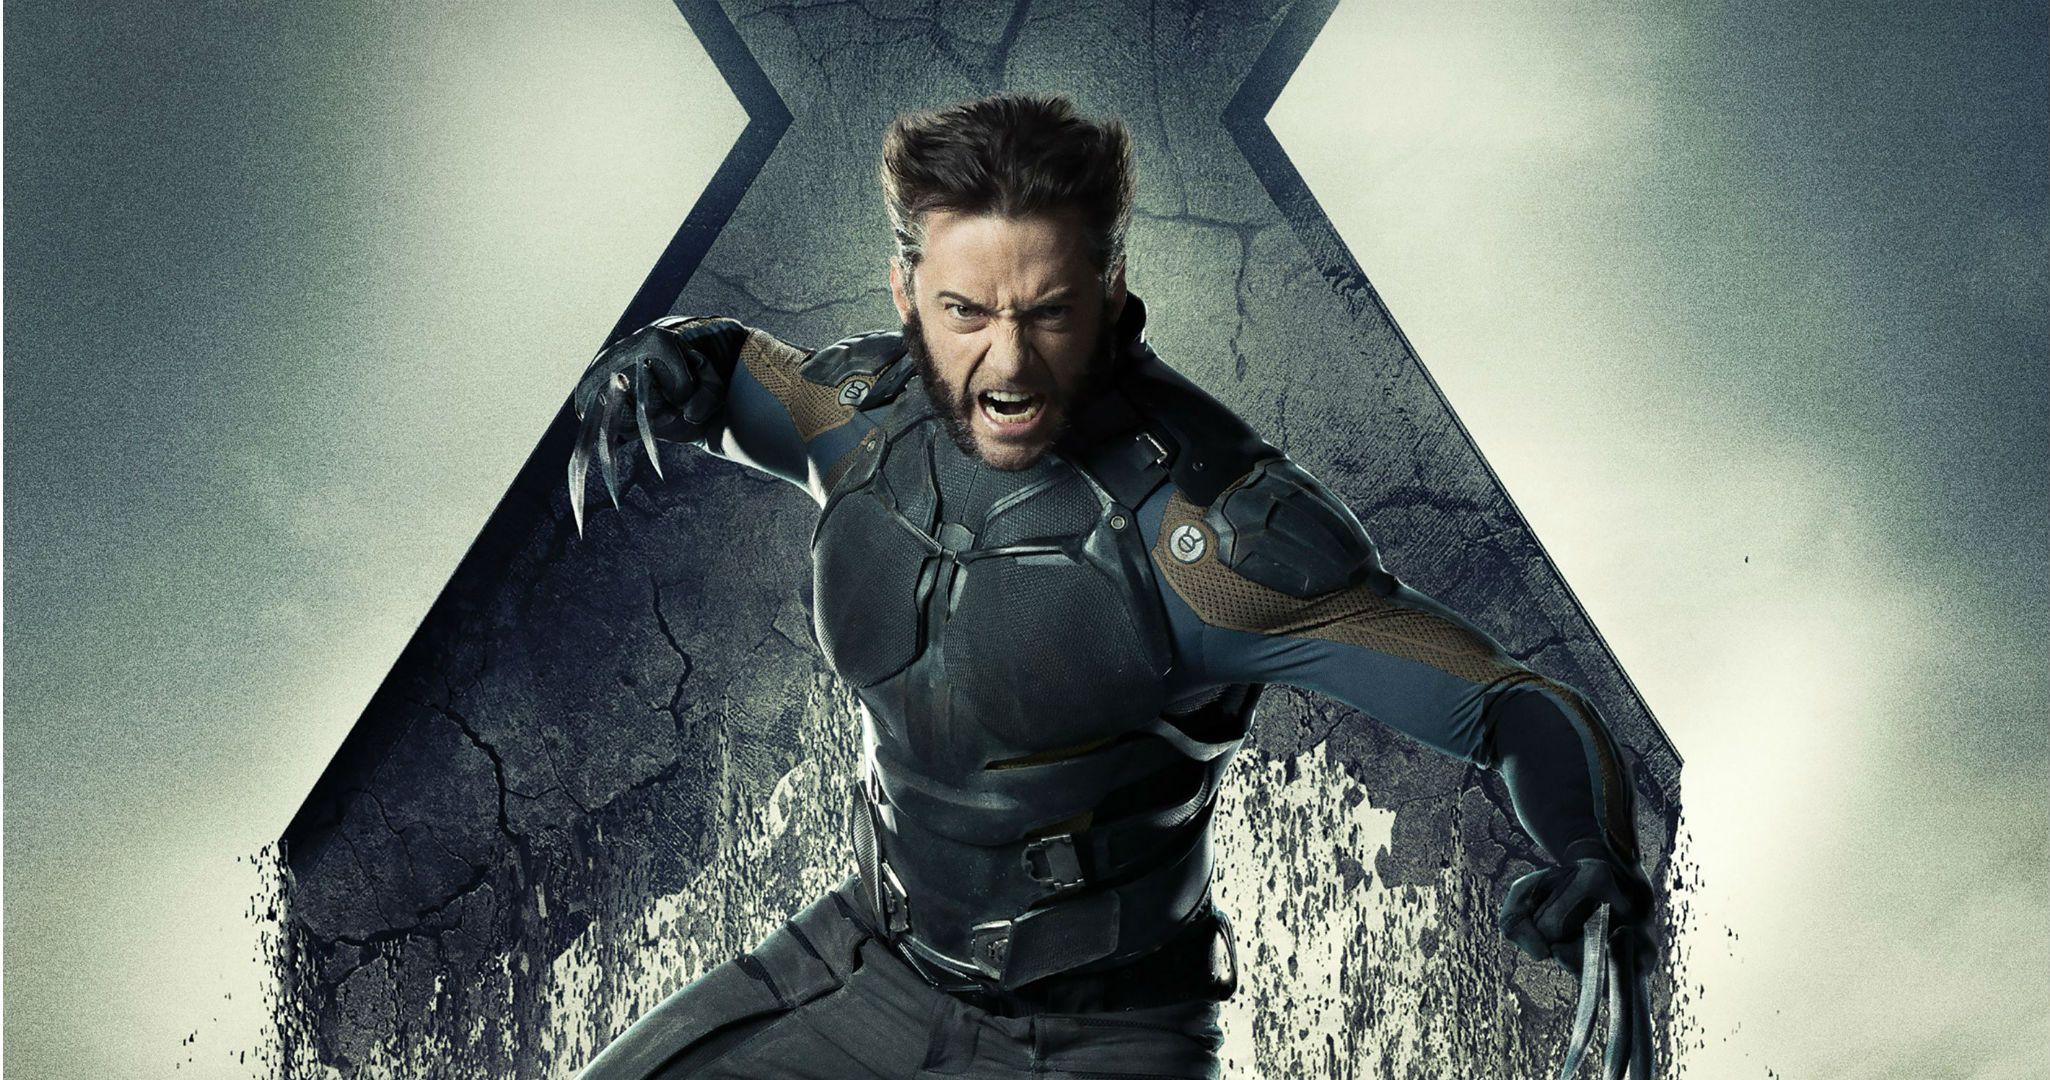 Hugh Jackman reveals his Wolverine injuries in throwback photo